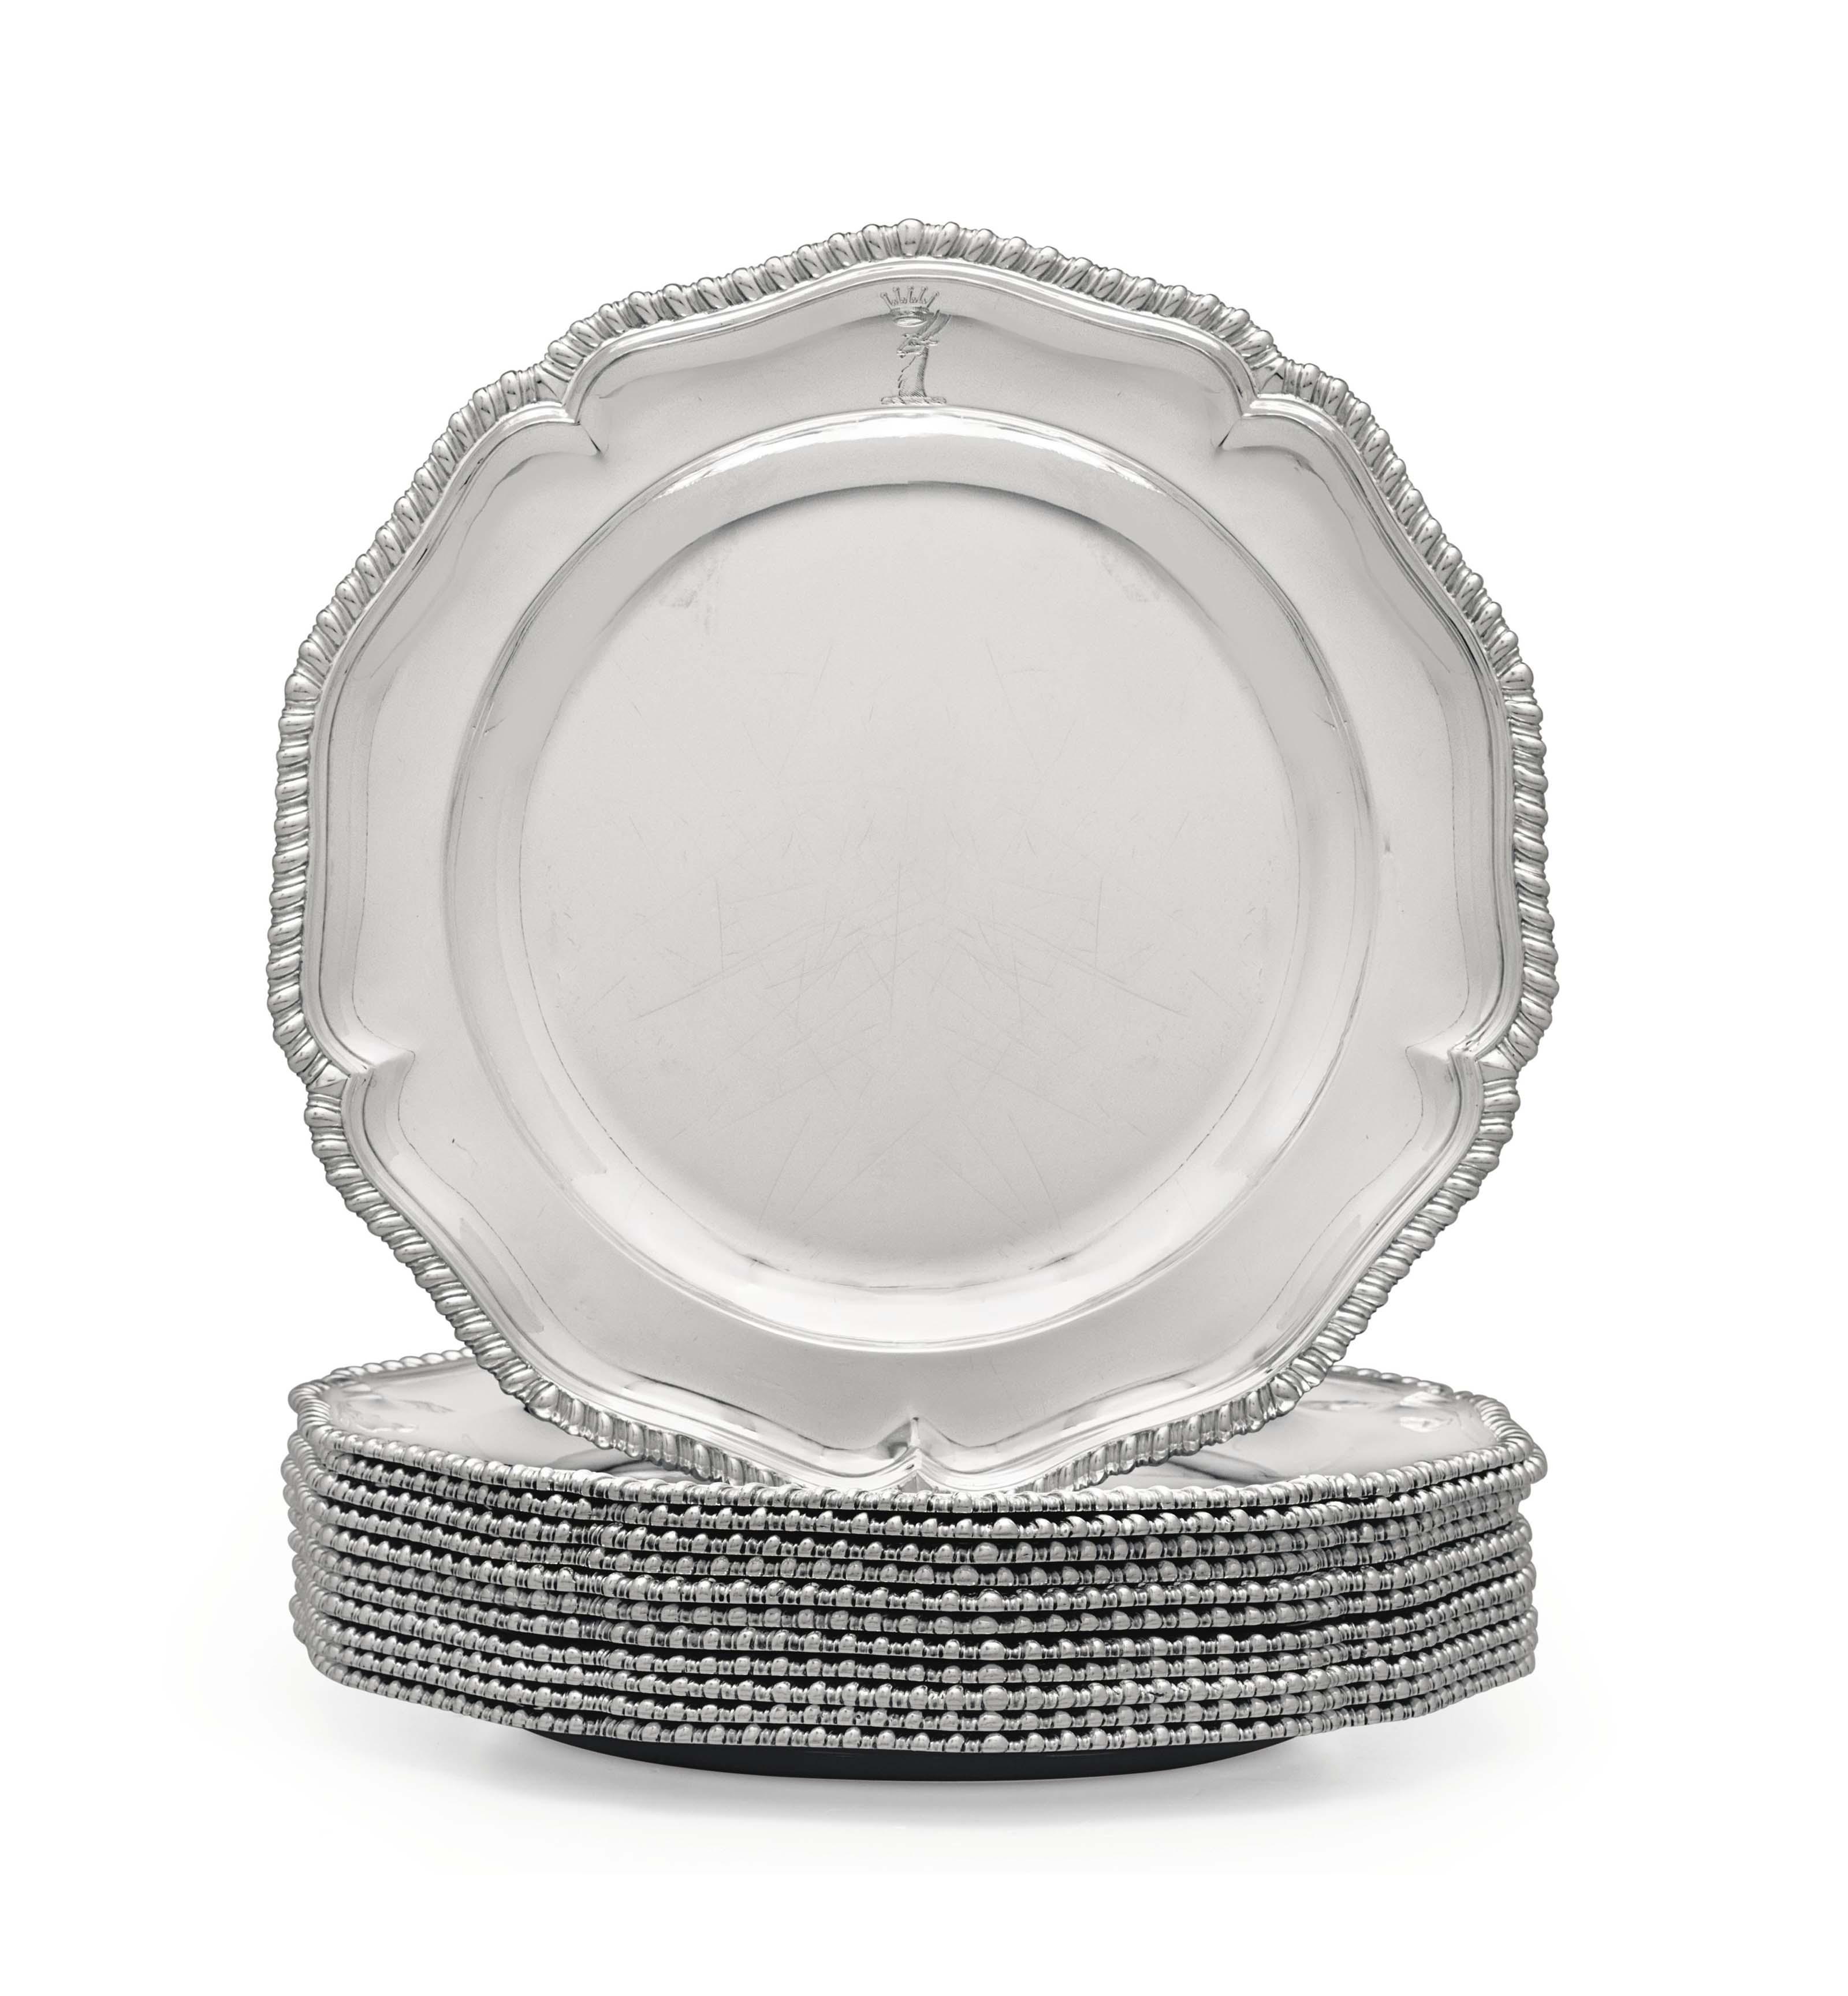 A SET OF TWELVE GEORGE III SILVER DINNER PLATES